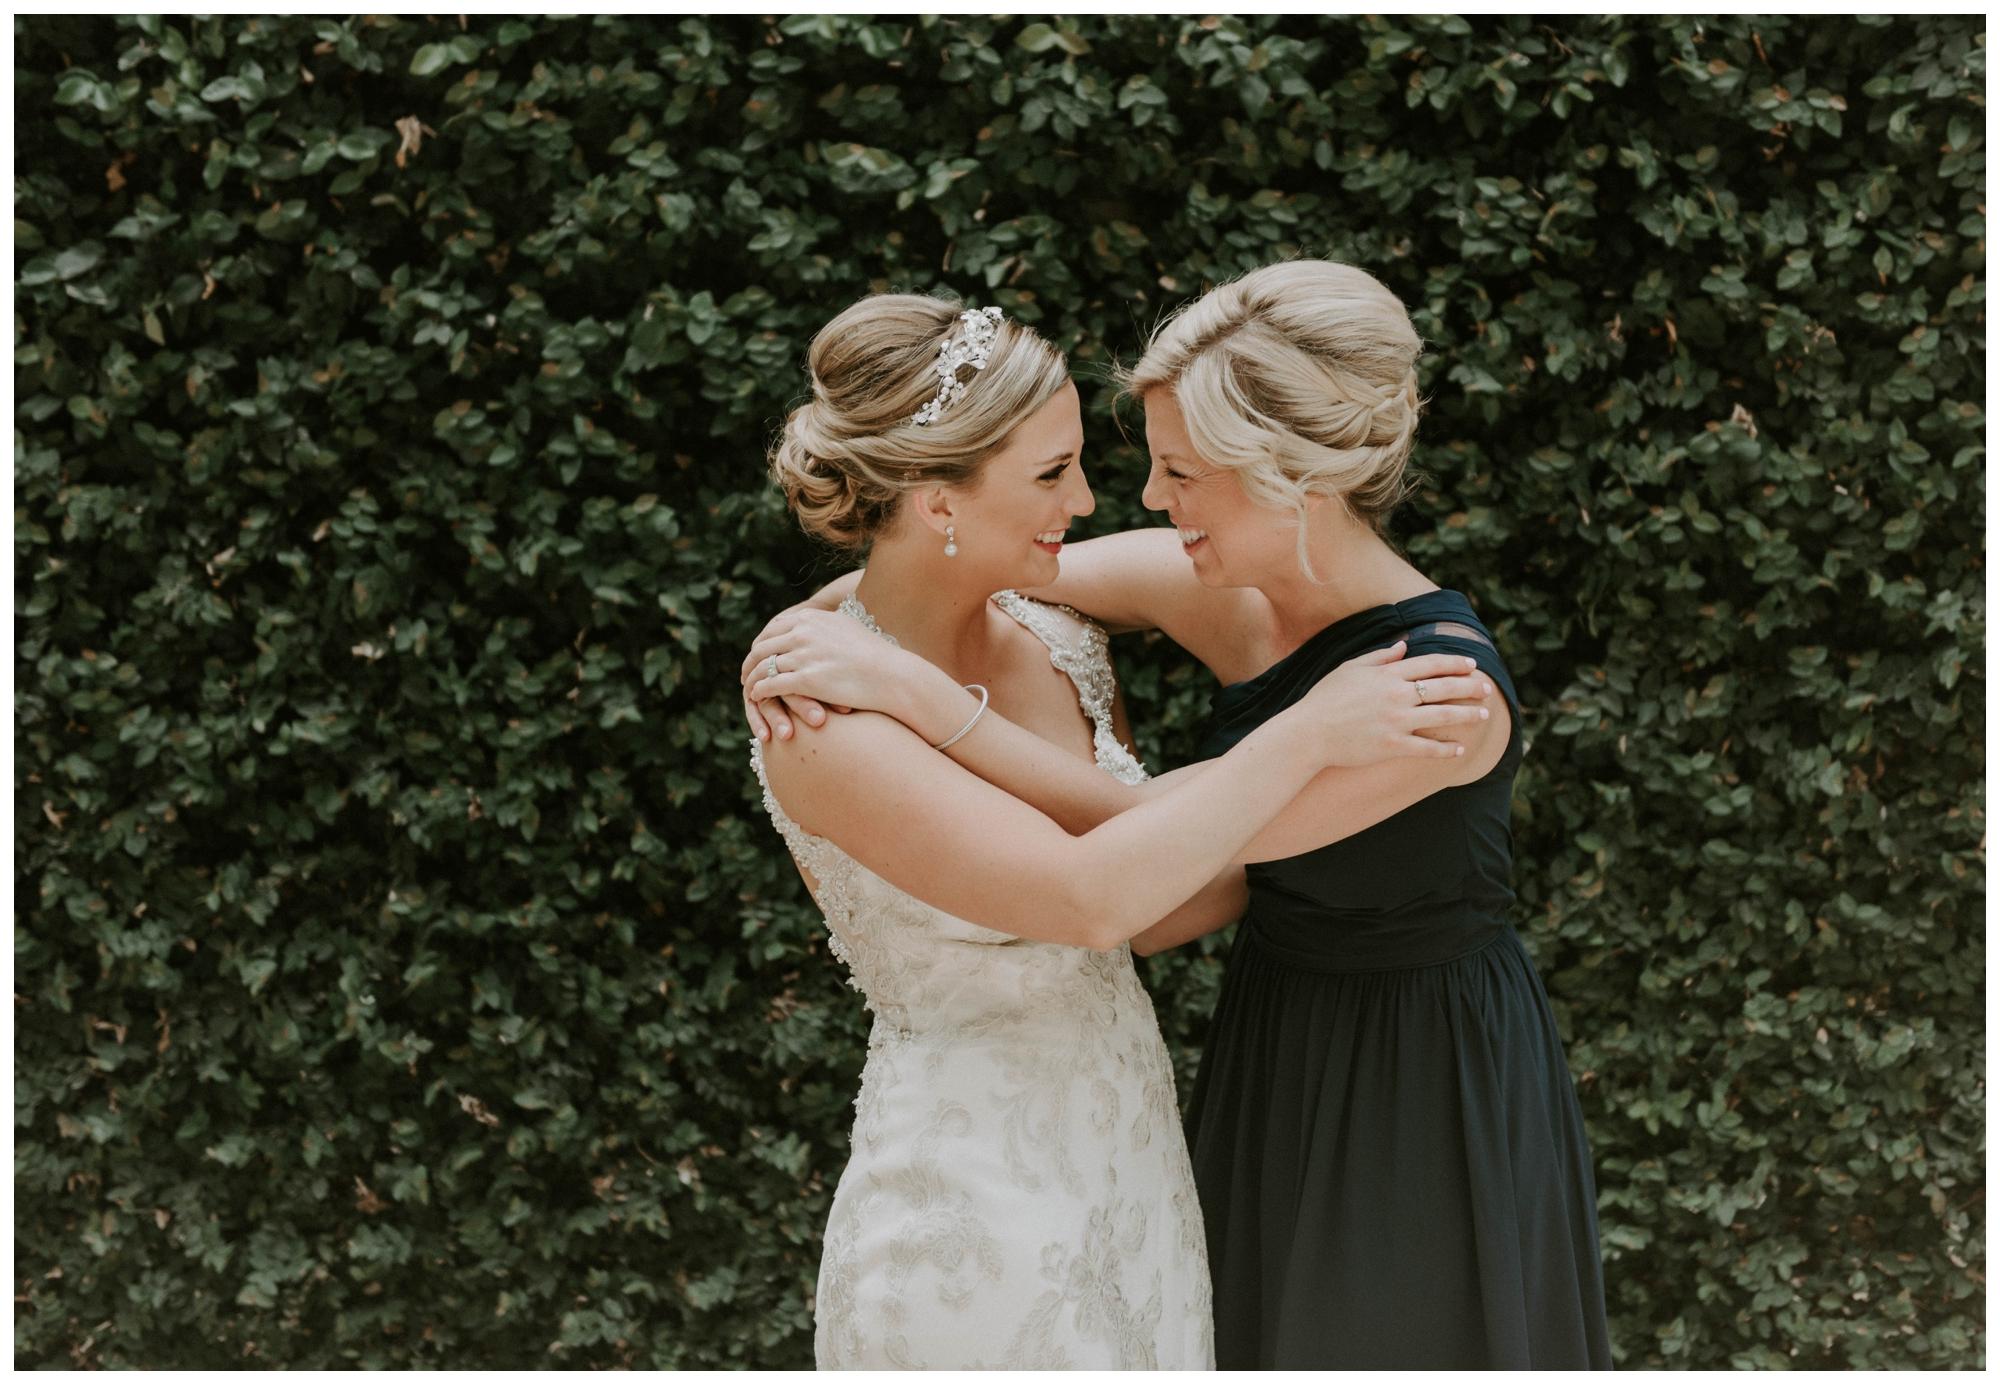 austin-texas-wedding-photography-1778-photographie_0028.jpg